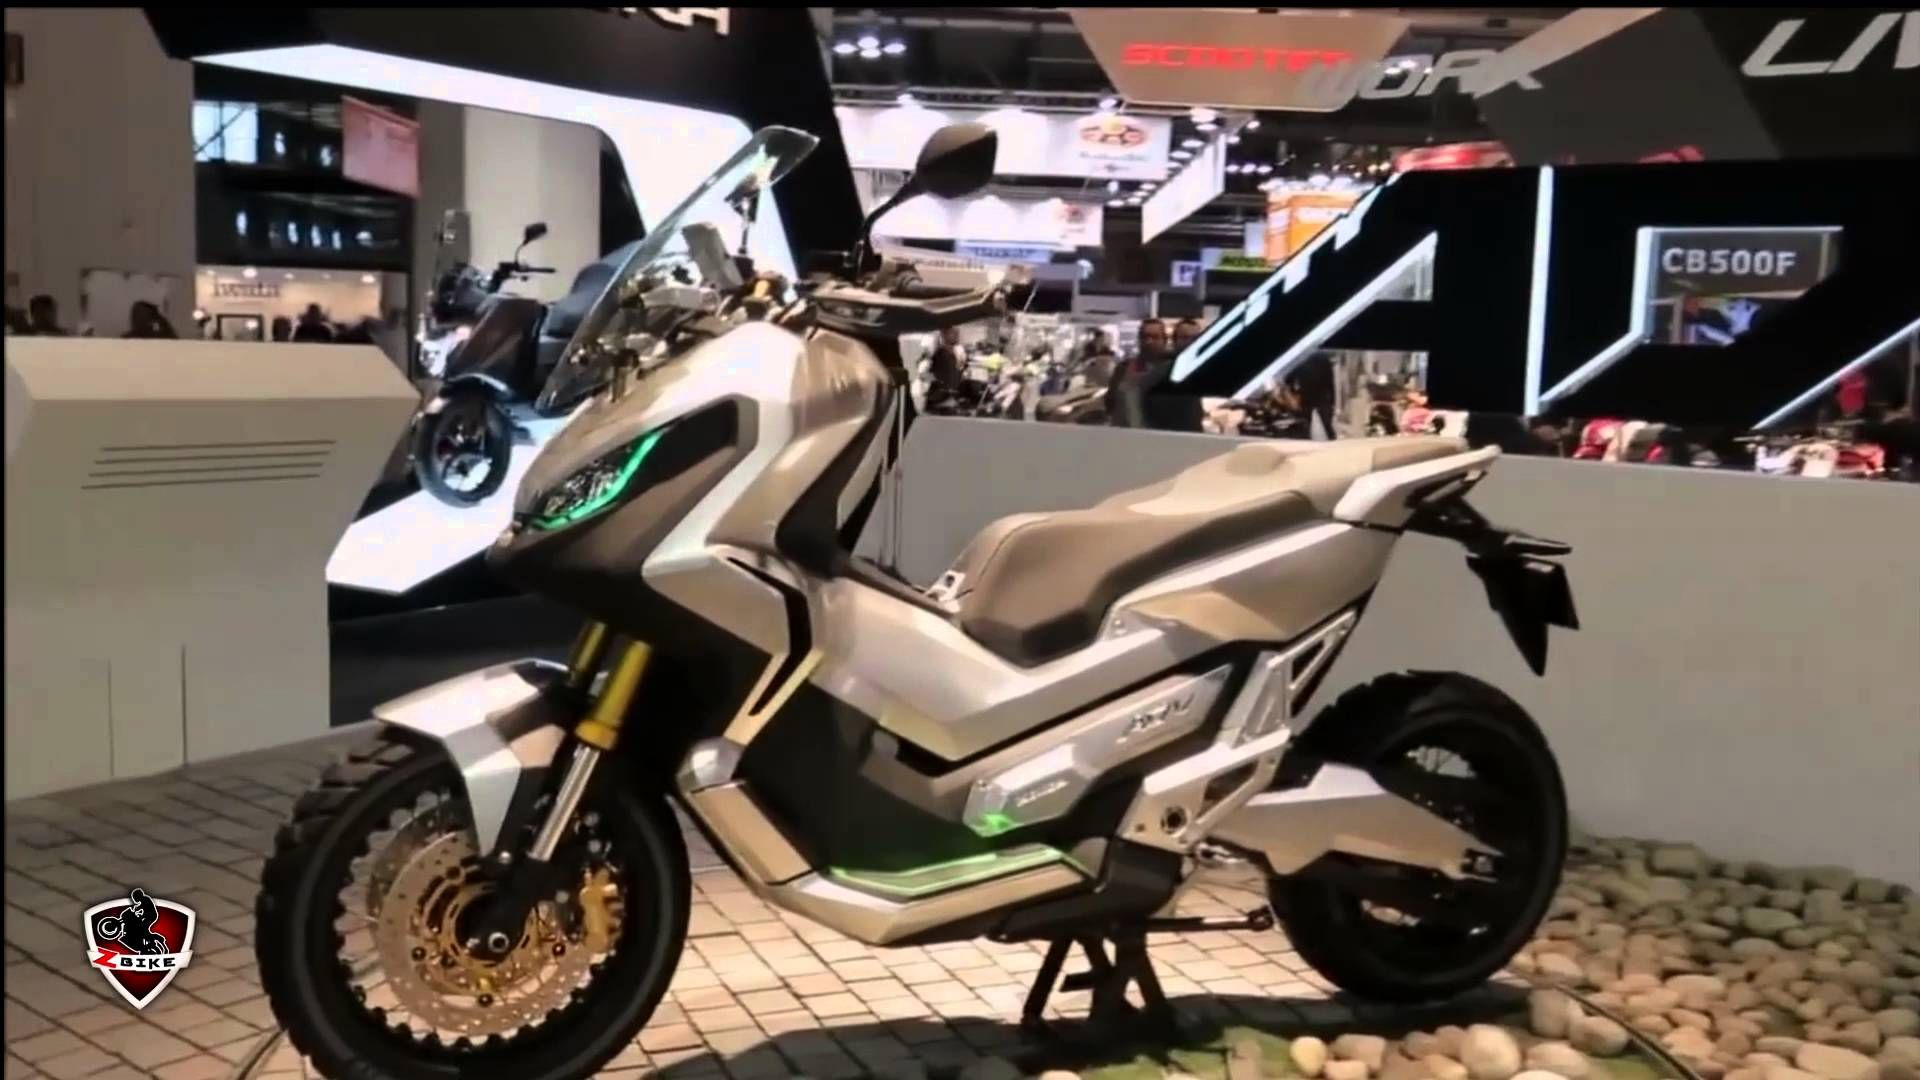 honda adv adventure scooter 2017 motos chivas pinterest motos y chivas. Black Bedroom Furniture Sets. Home Design Ideas